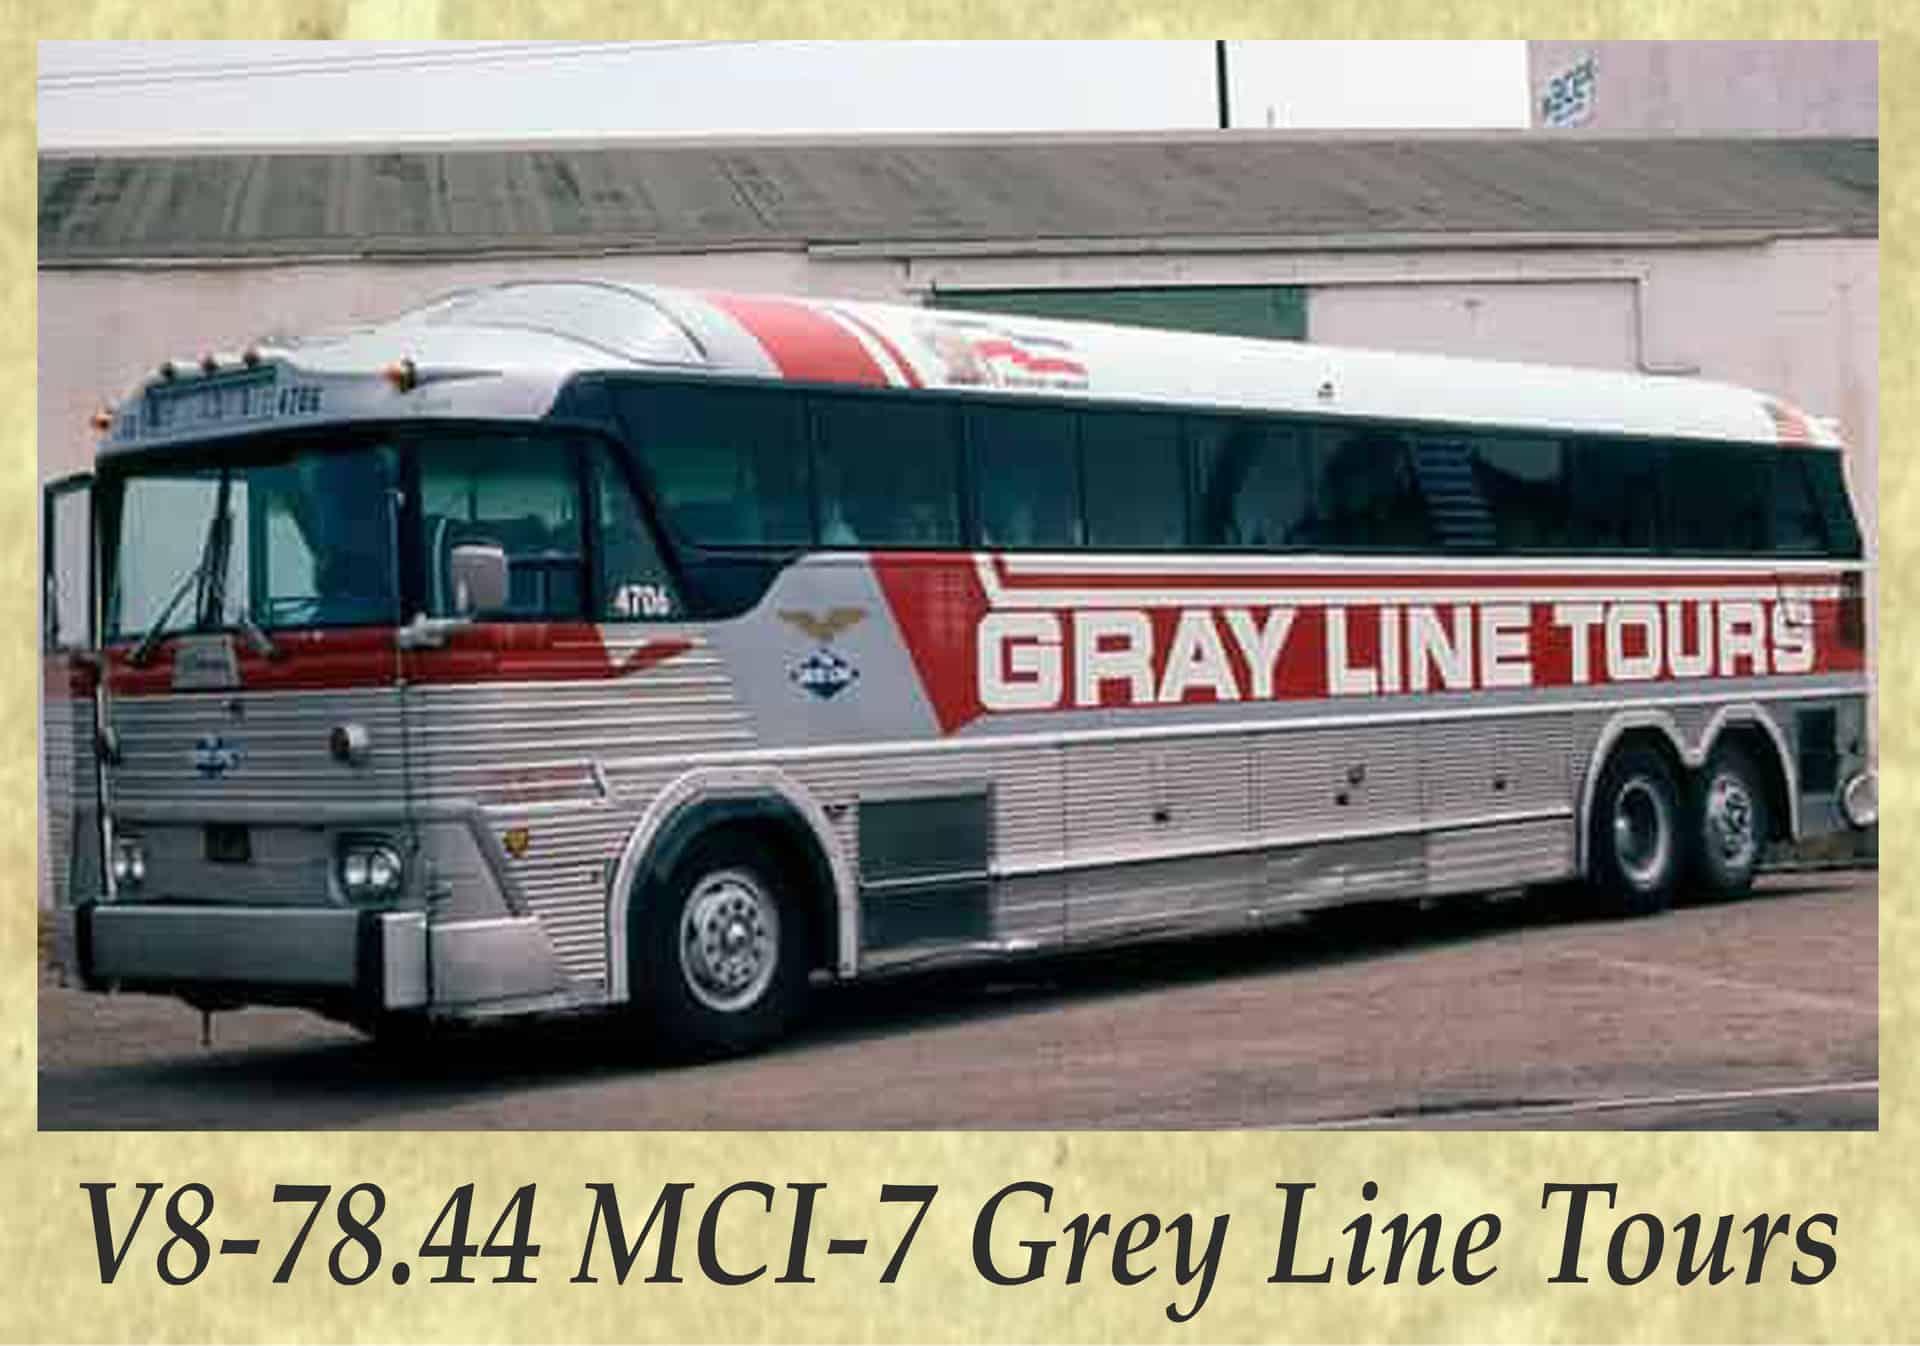 V8-78.44 MCI-7 Grey Line Tours